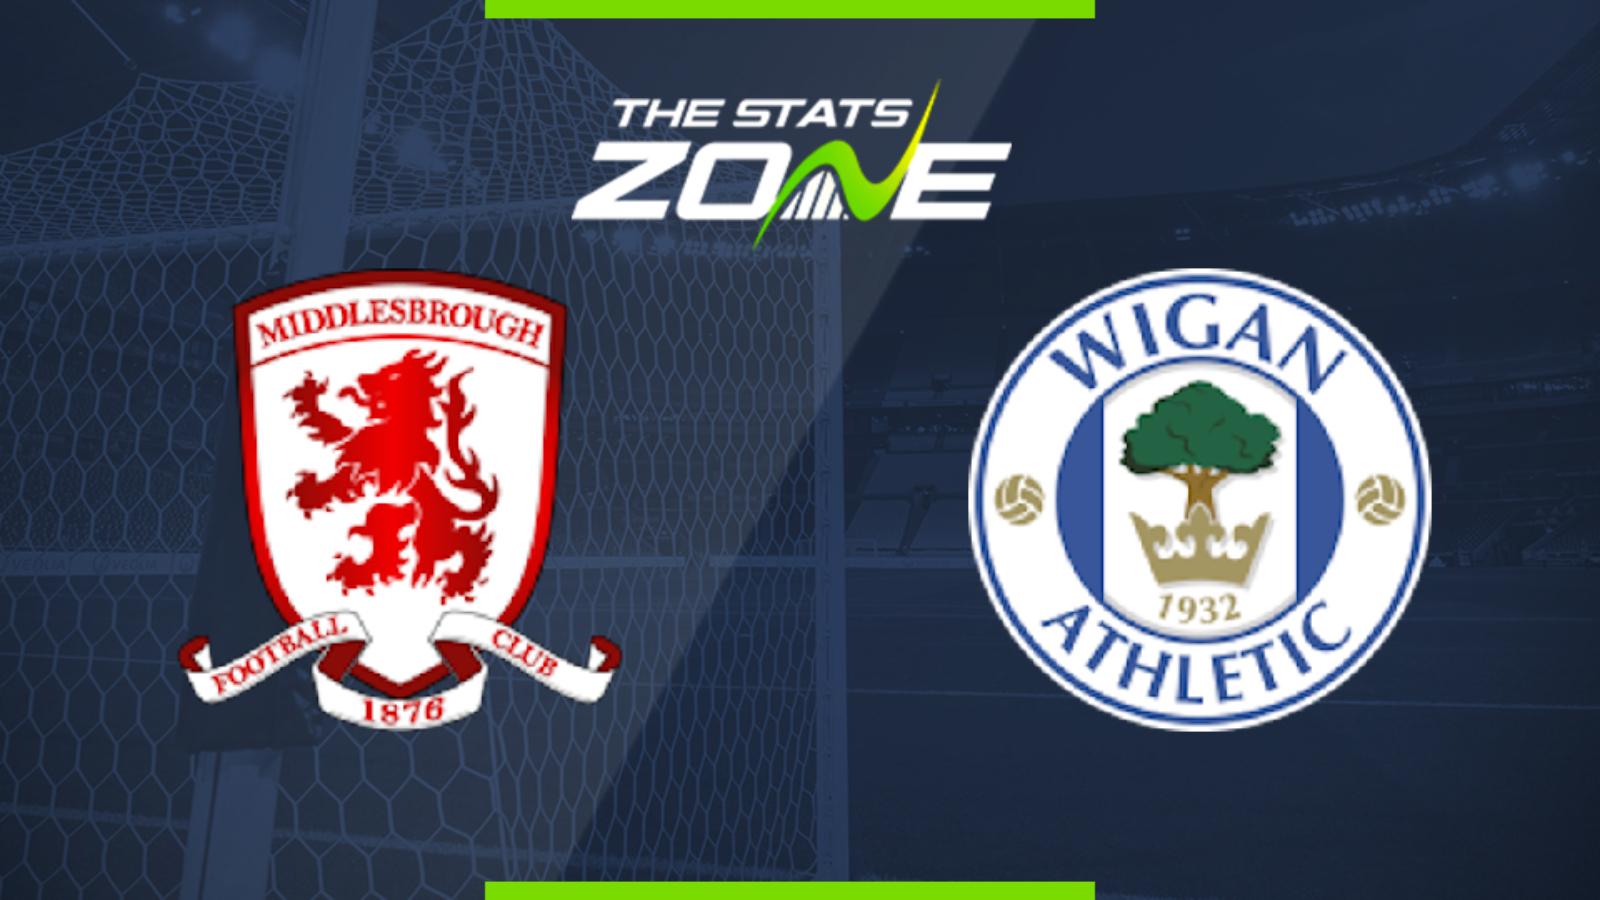 Prediksi Bola Middlesbrough Vs Wigan Athletic 21 Agustus 2019